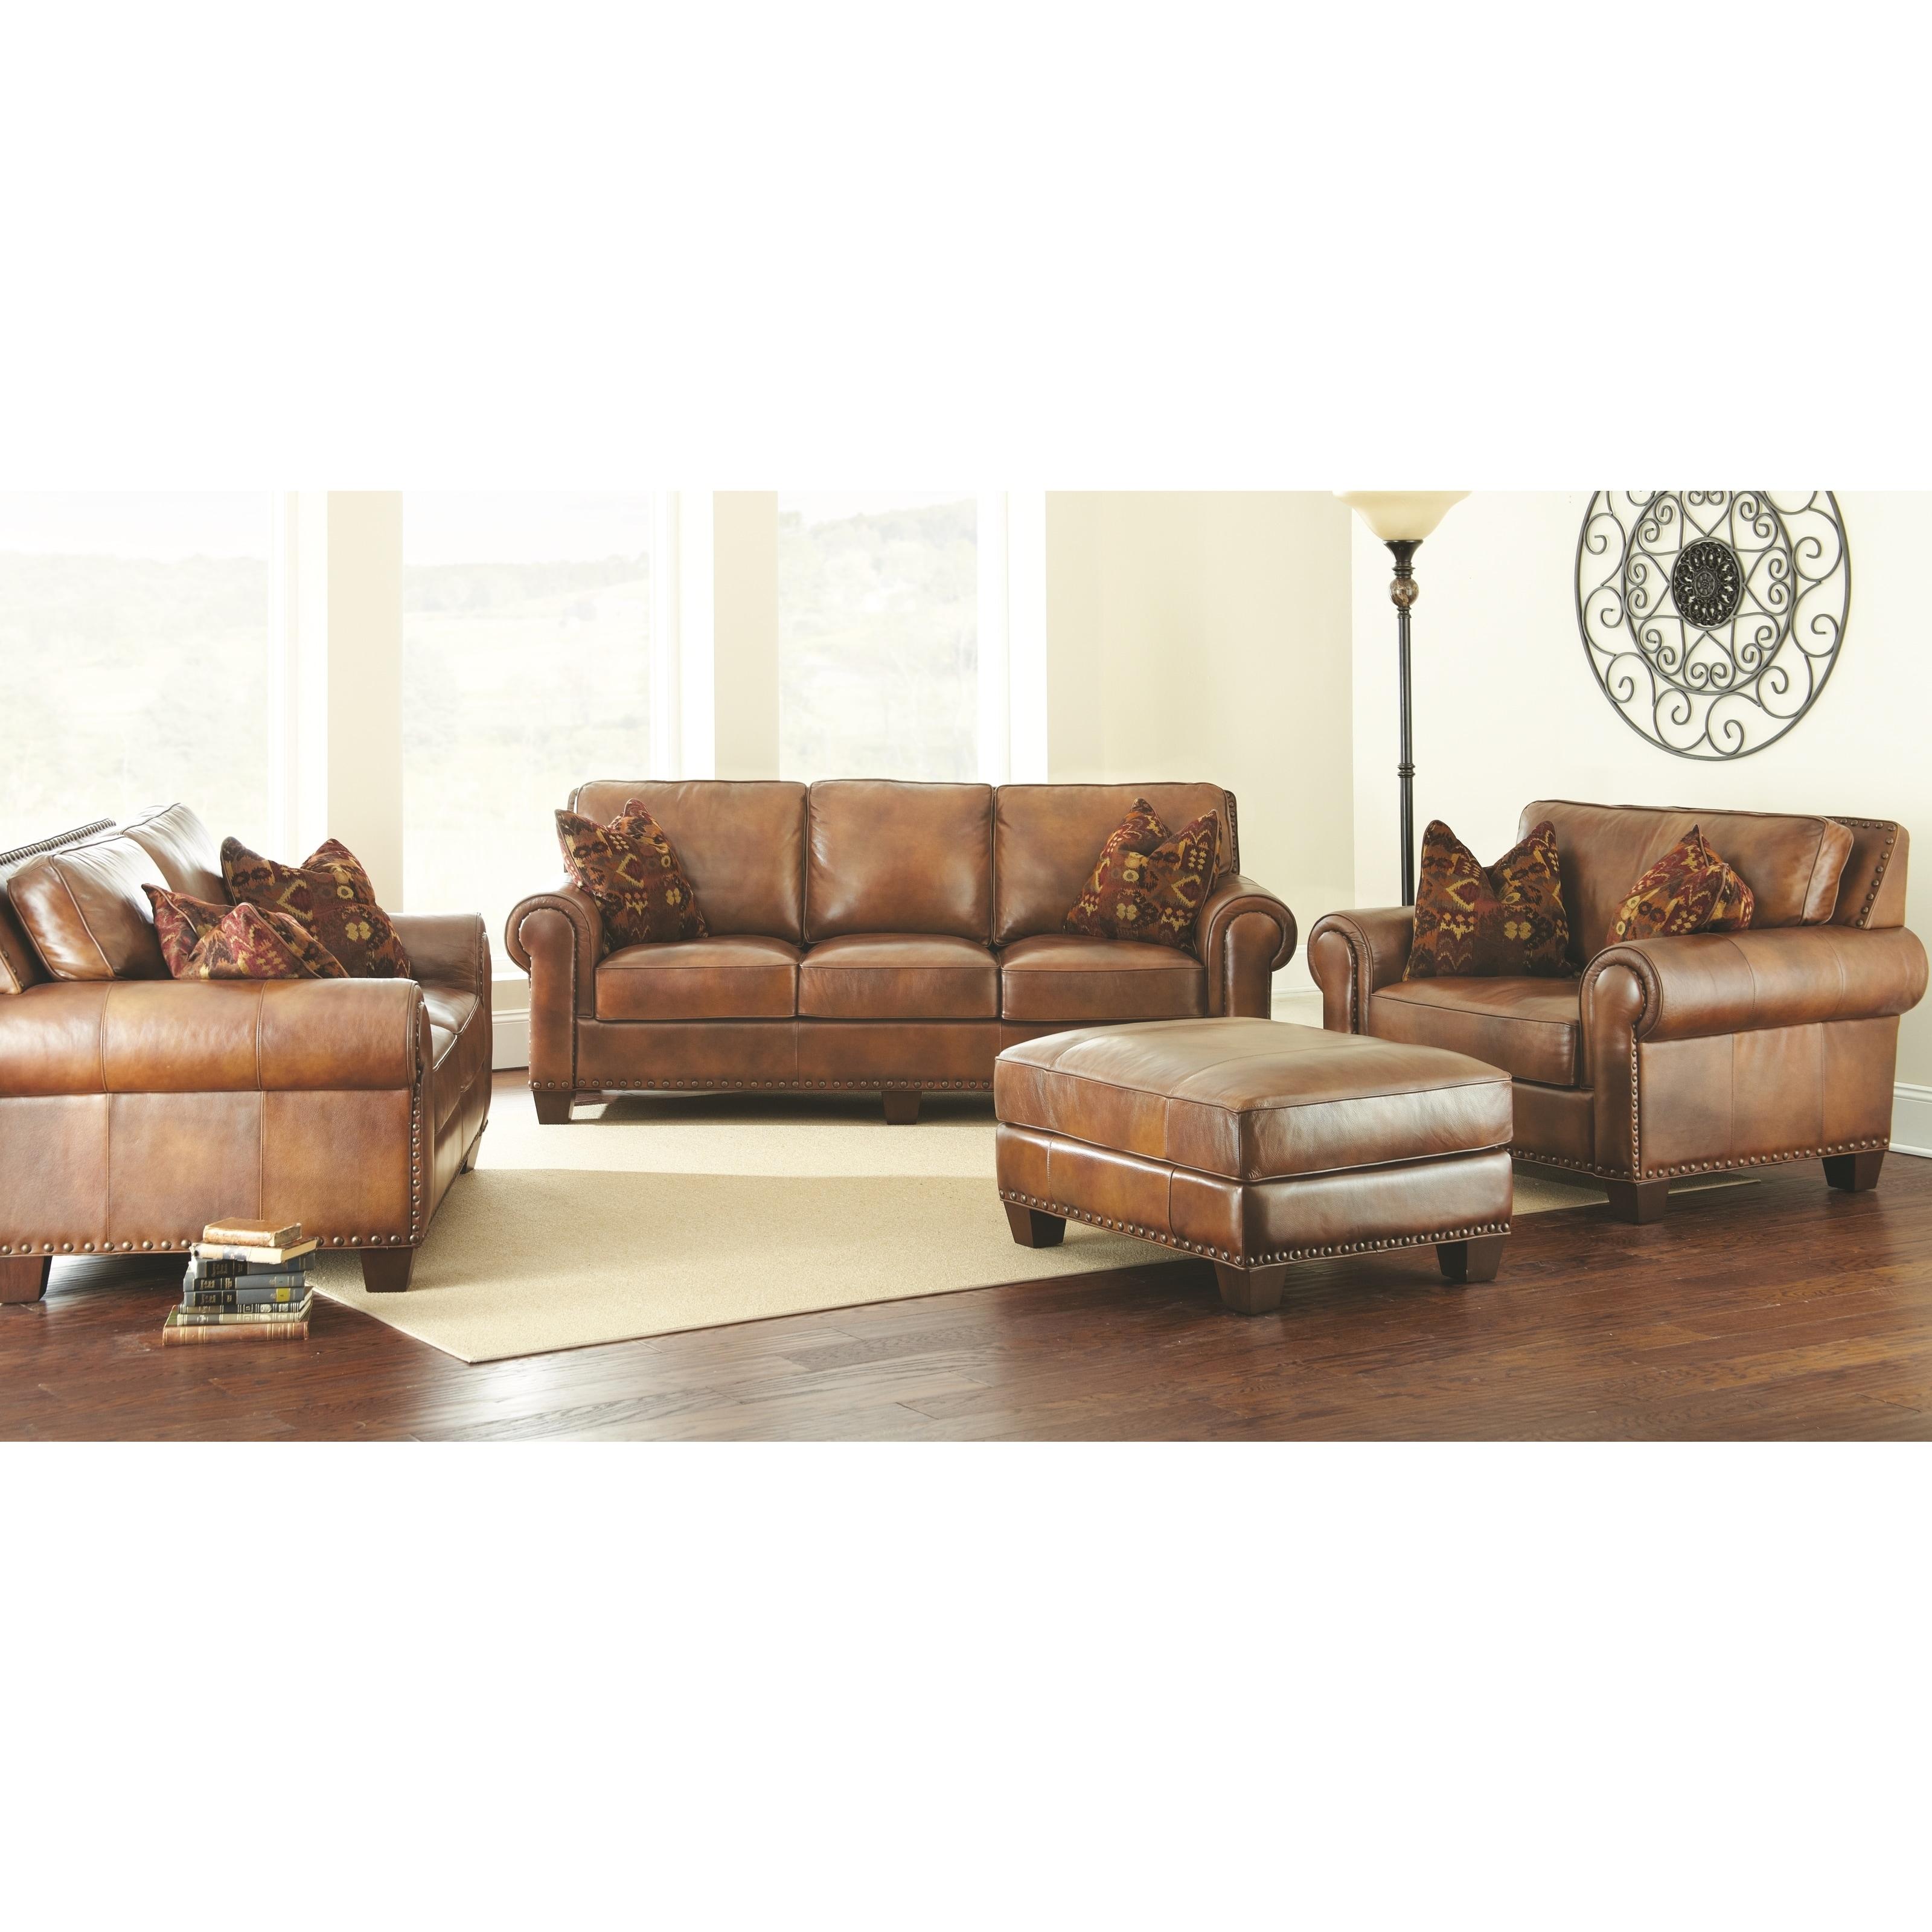 Buy Brown, Leather Living Room Furniture Sets Online at ...